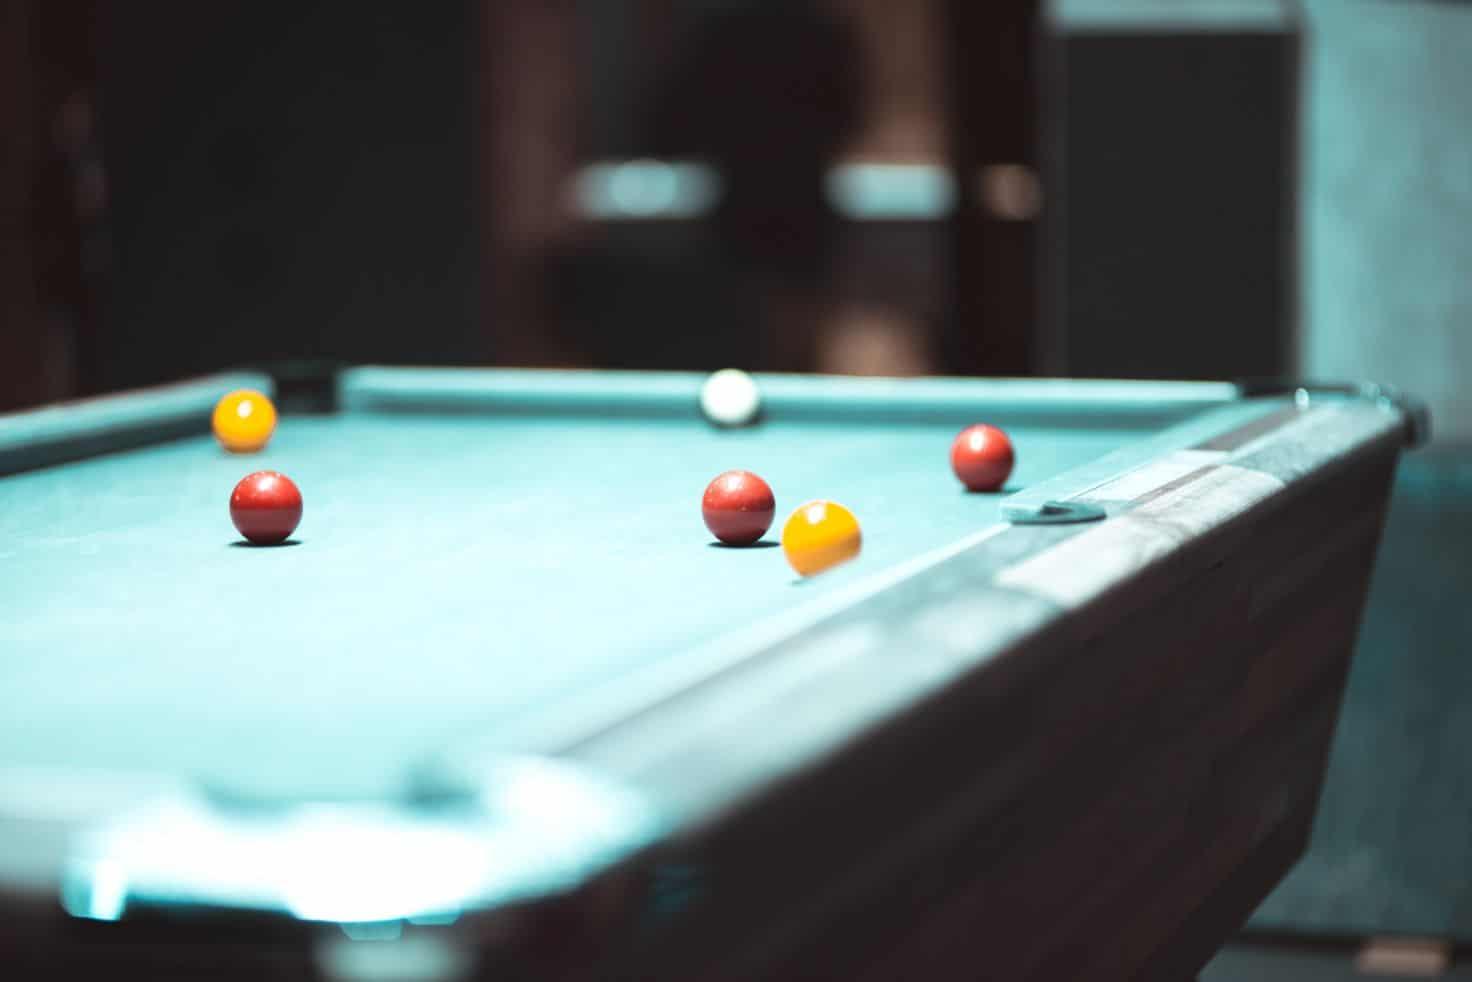 game-room-must-haves-2-billiards-table-unsplash